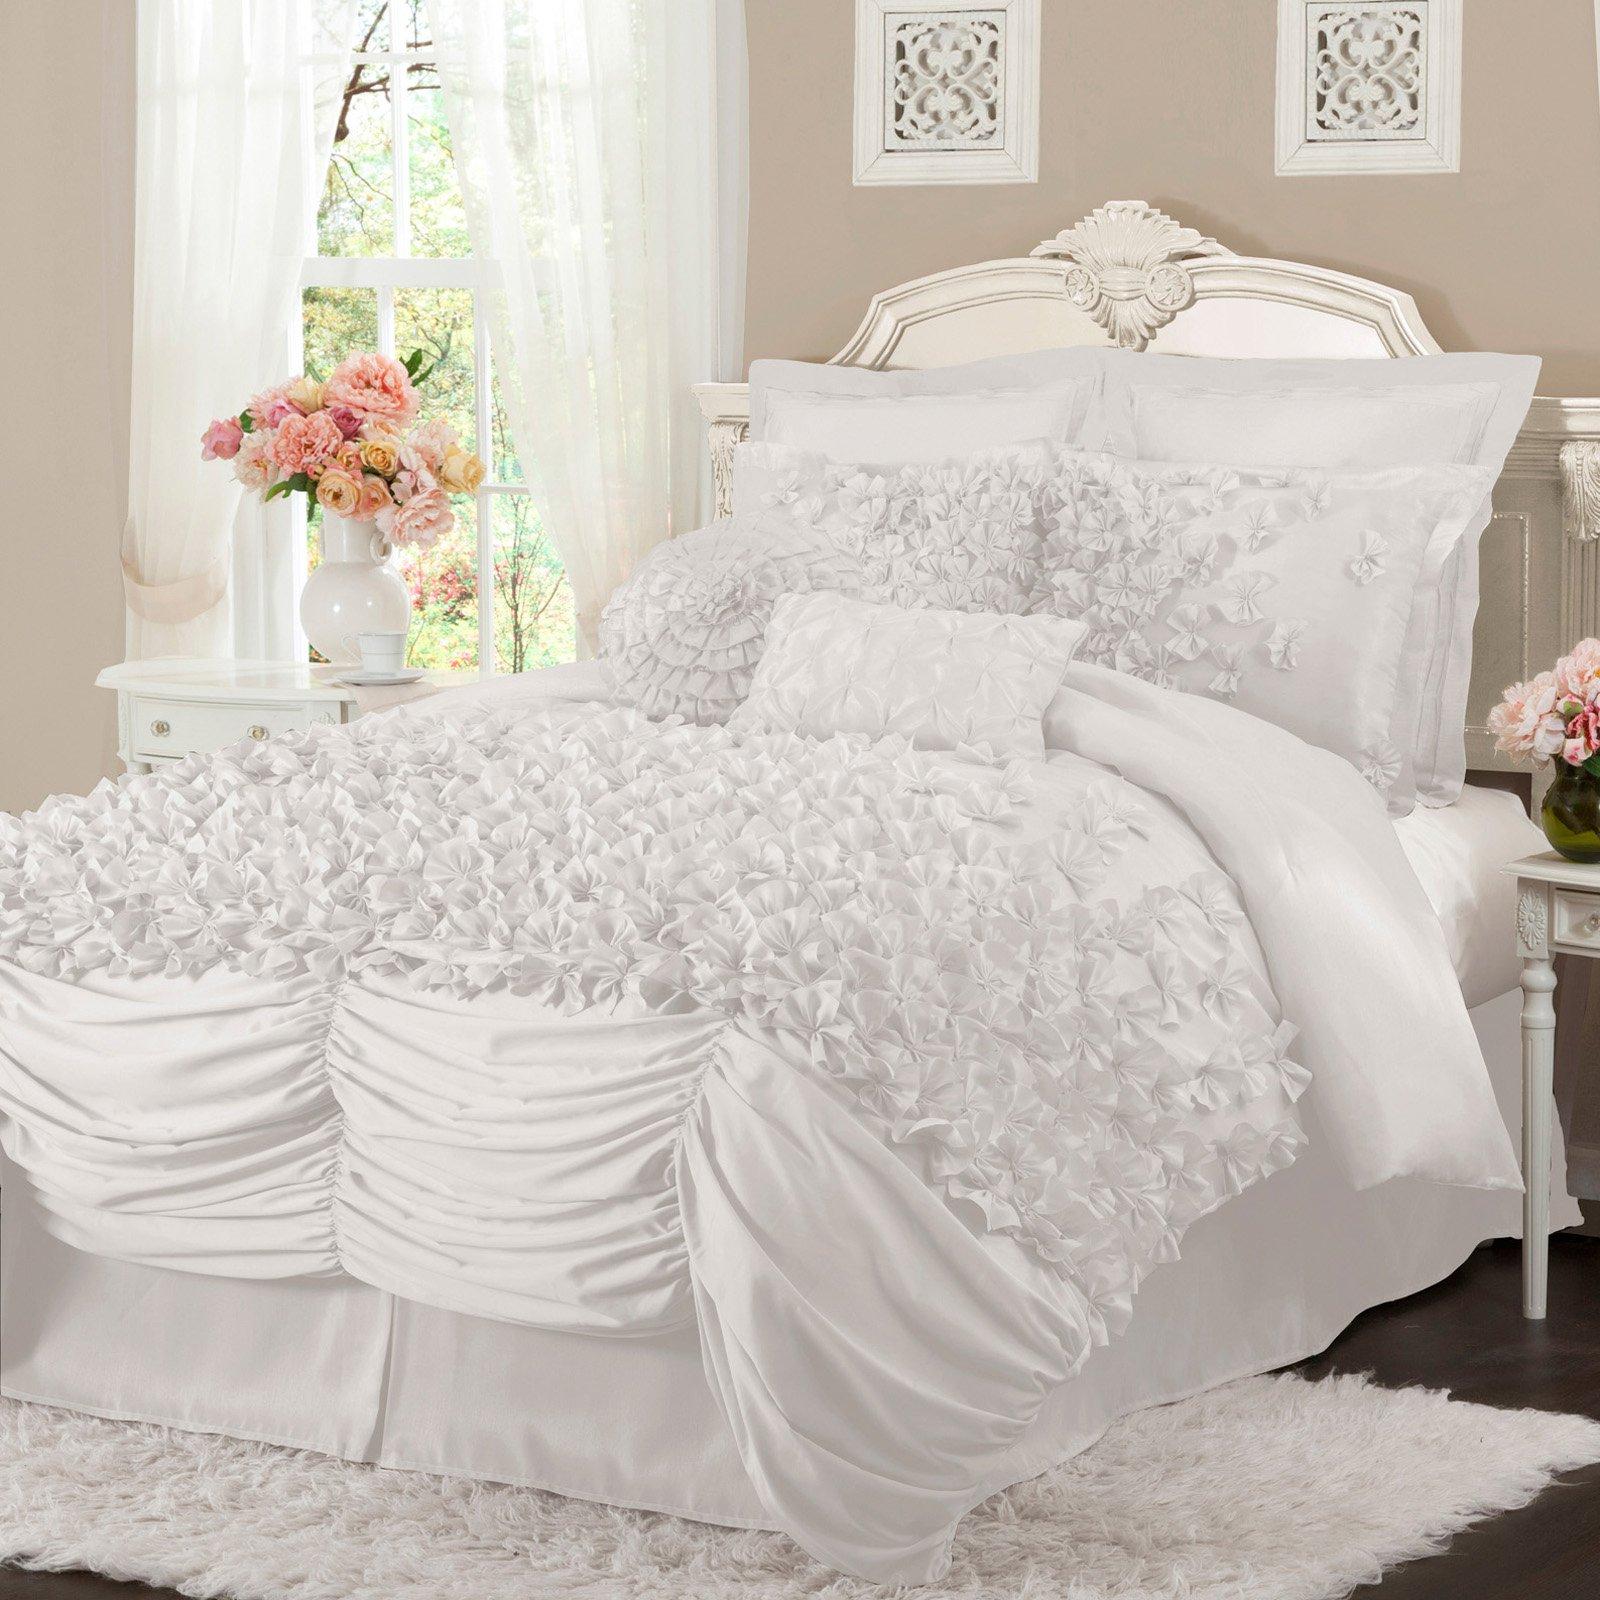 Lucia 4-Piece Bedding Comforter Set